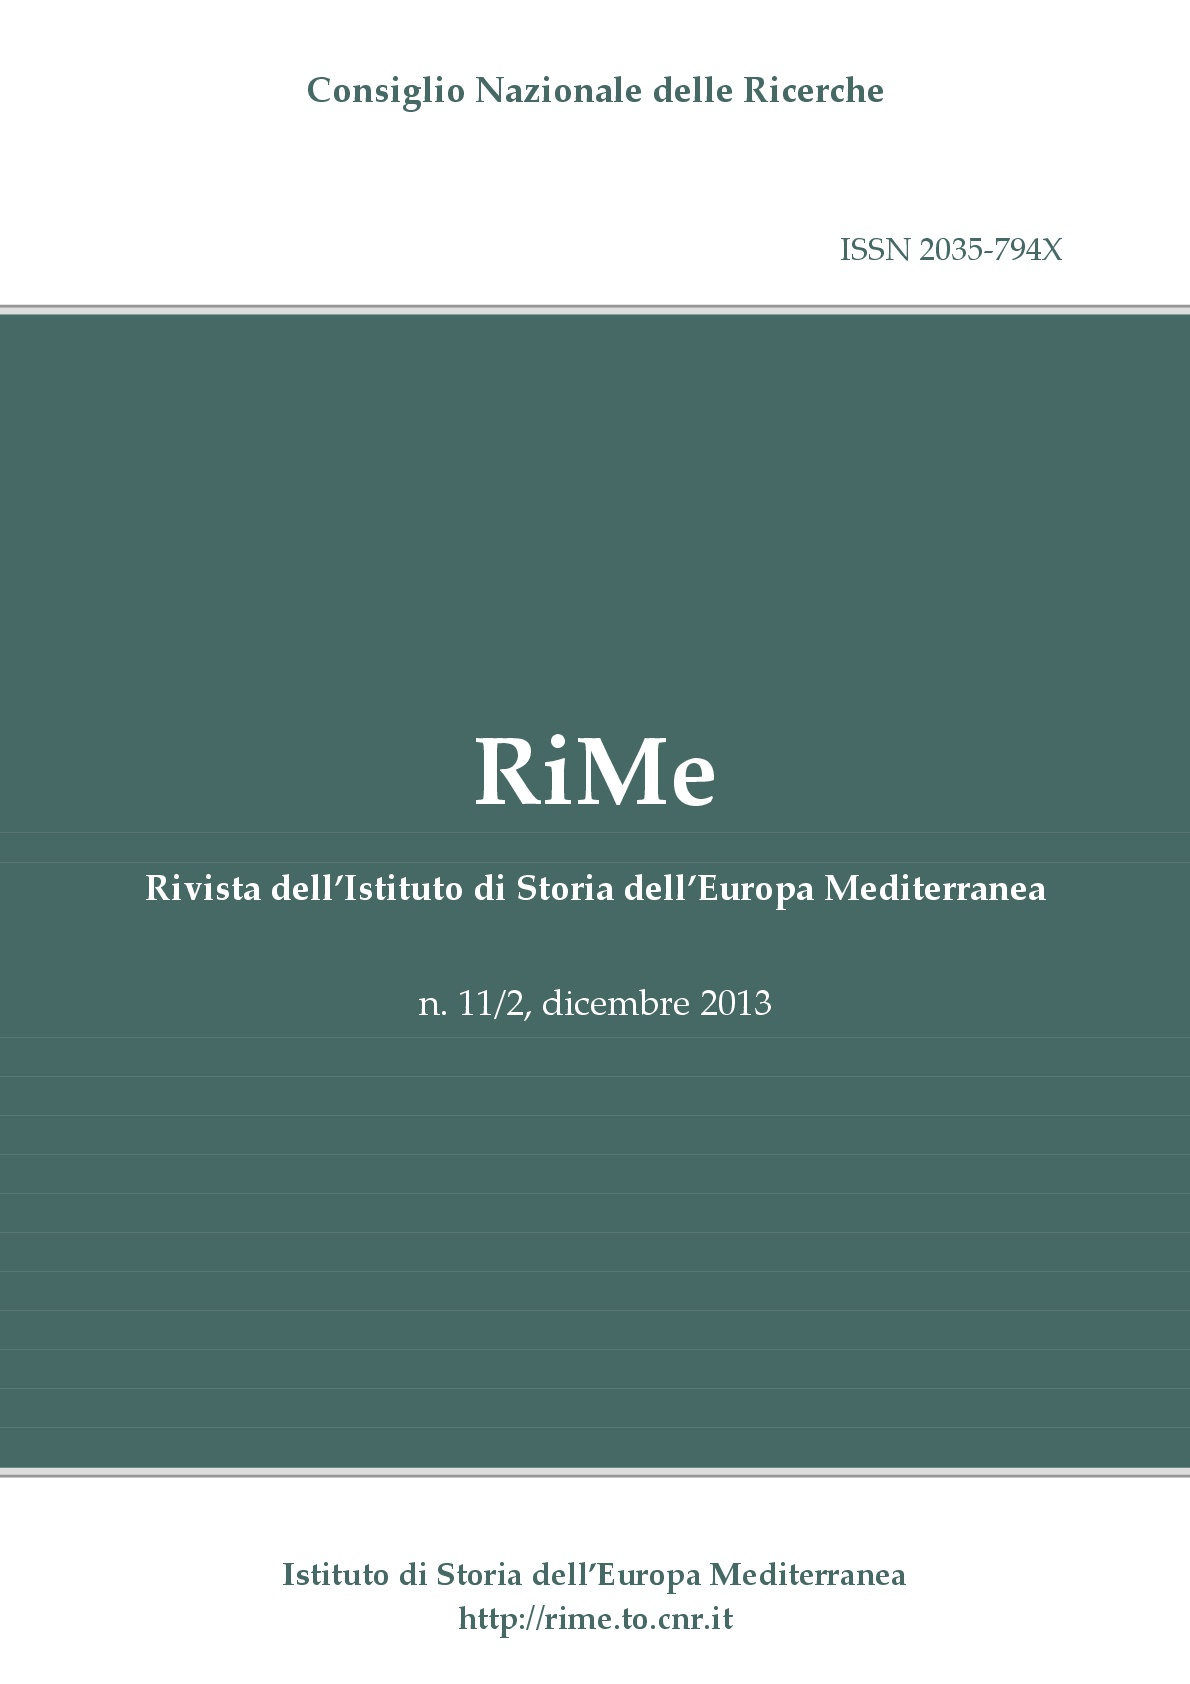 Vol. 11/2 (December 2013) cover